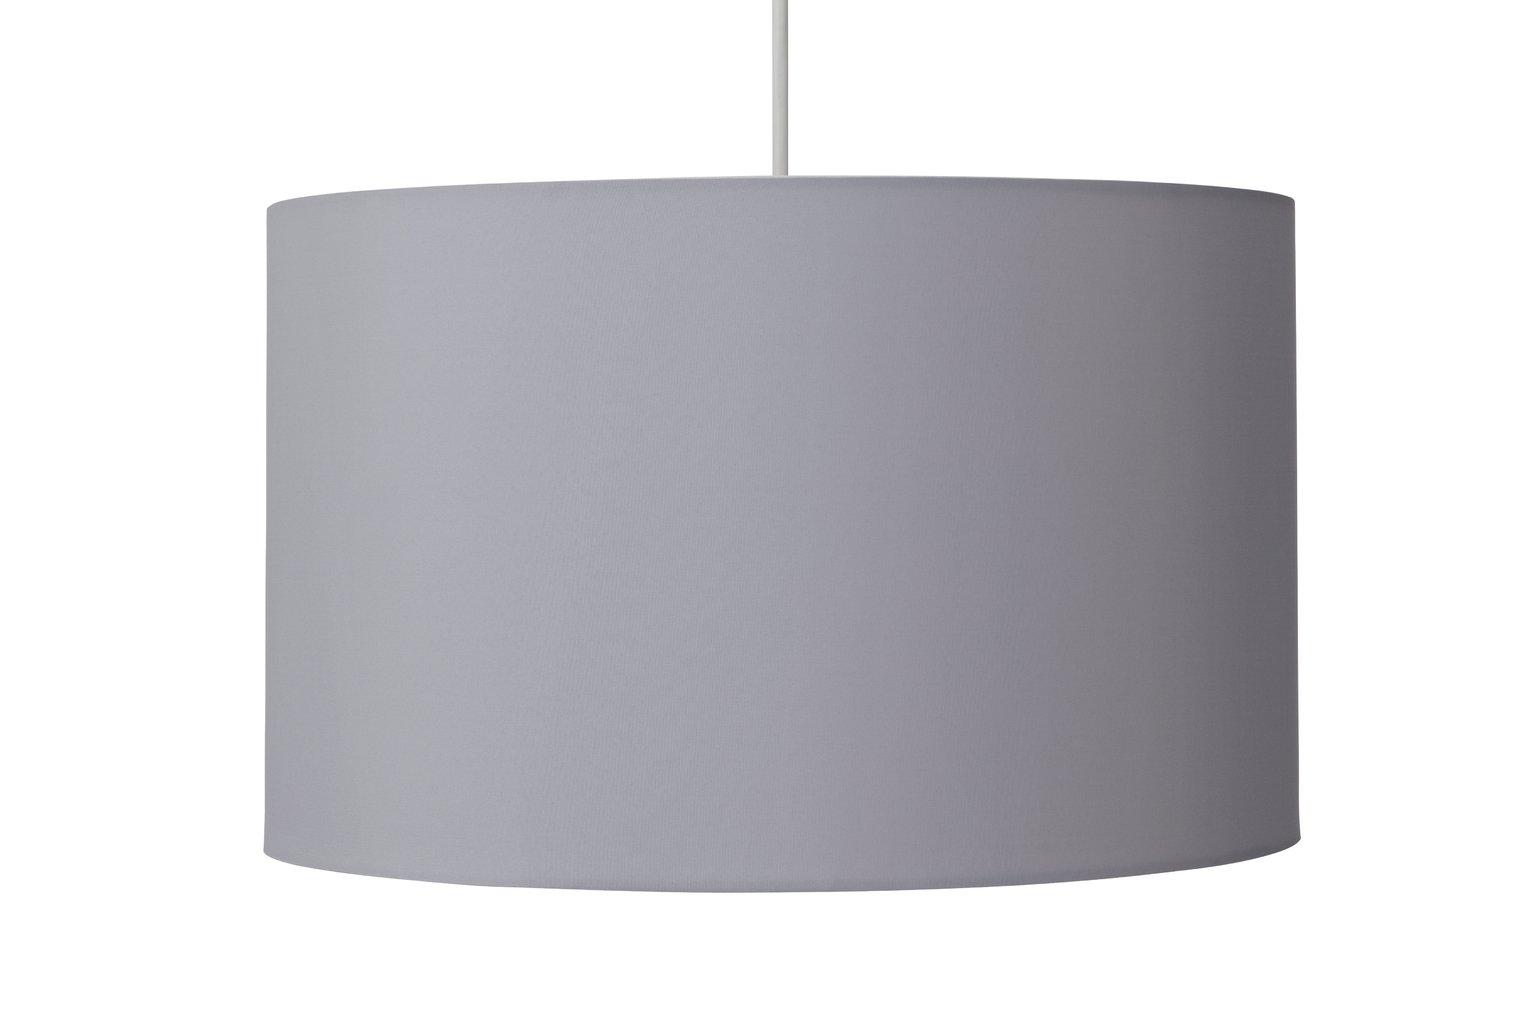 Argos Home Large Drum Shade - Dove Grey